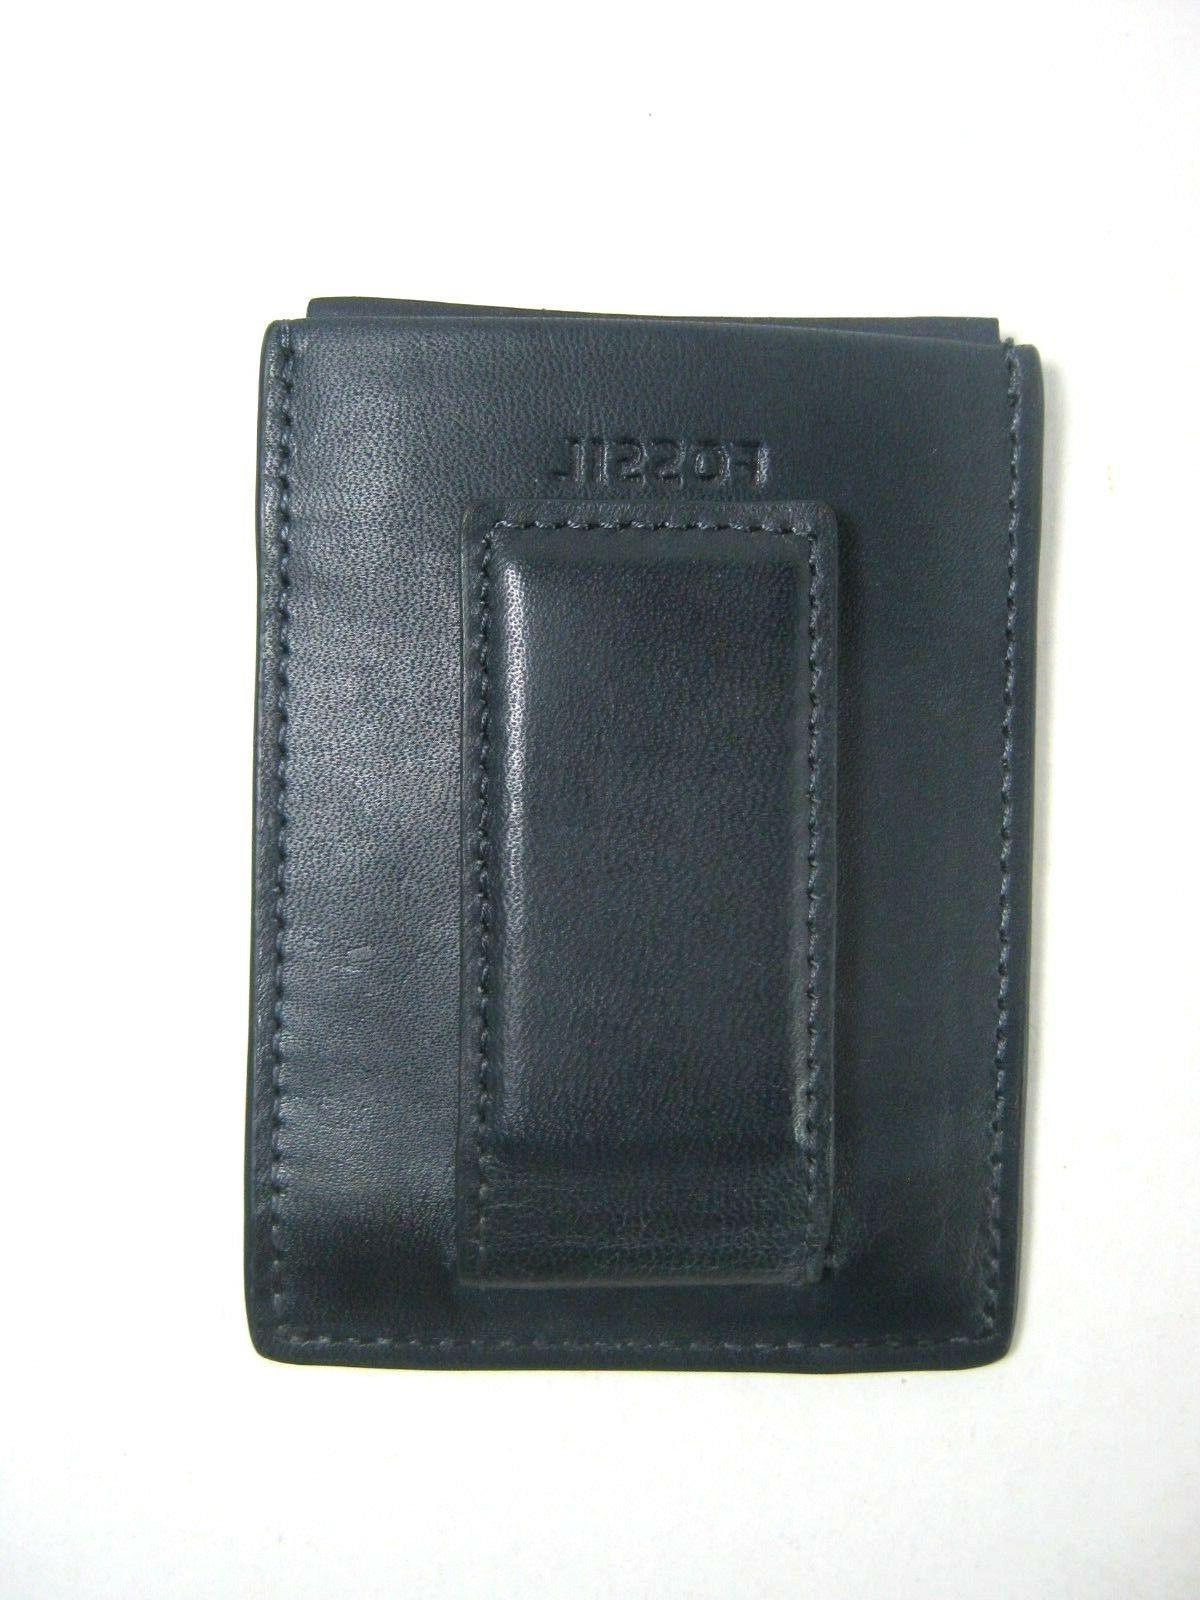 Fossil RFID Blocking Money Card